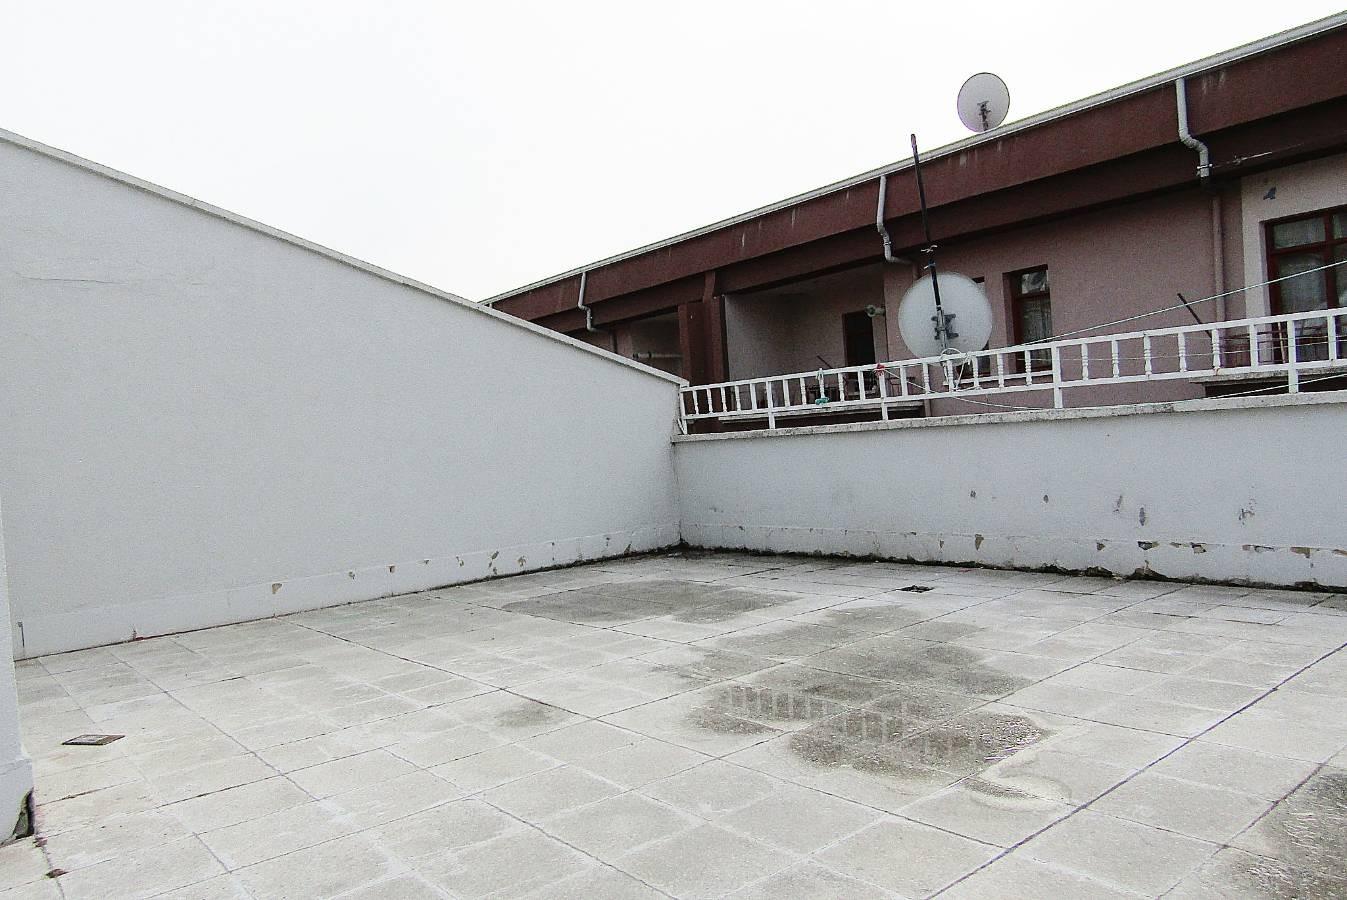 SR EMLAK'TAN PİYADE MAH'DE 5+1 200m² ÖN CEPHE TERAS DAİRE